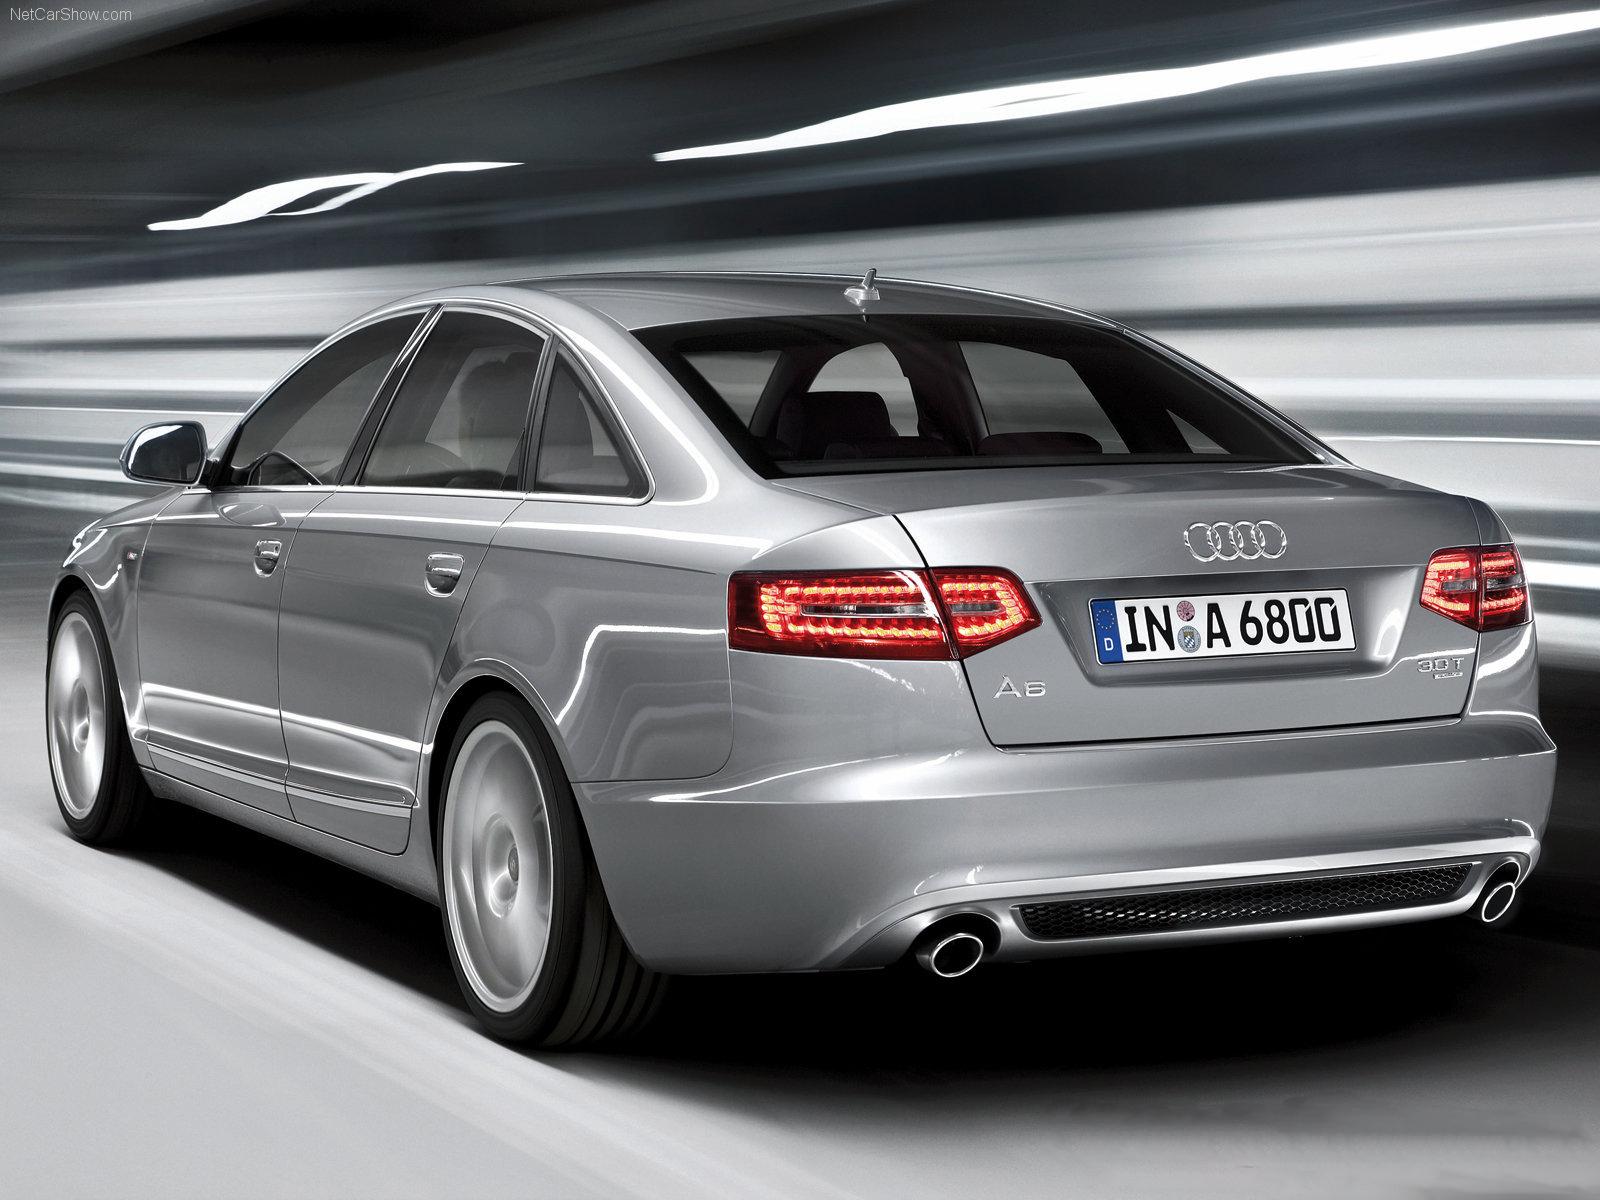 Automotive Database: Audi A6 on audi matte blue vinyl, audi s4, stanced audi s6 c6, audi a2, 2006 a6 c6, audi stretch and poke,